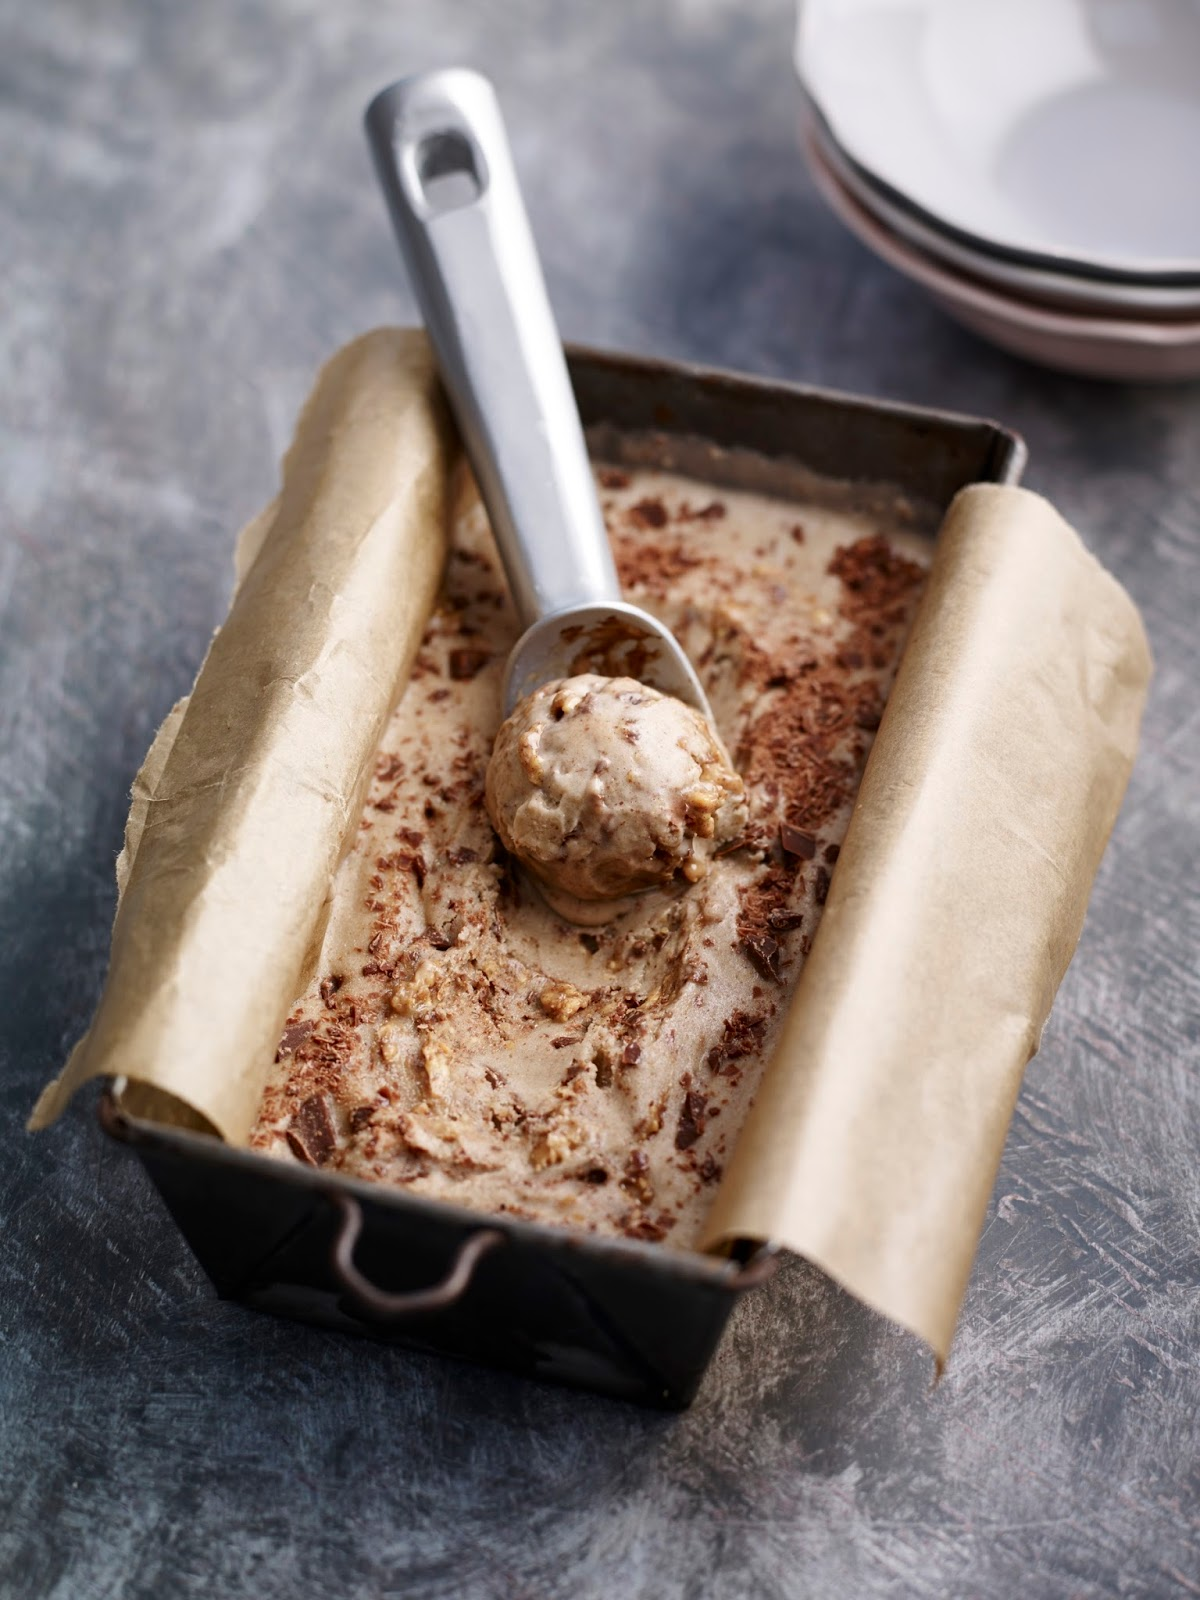 Peanut Butter Chocolate Chunk Ice Cream